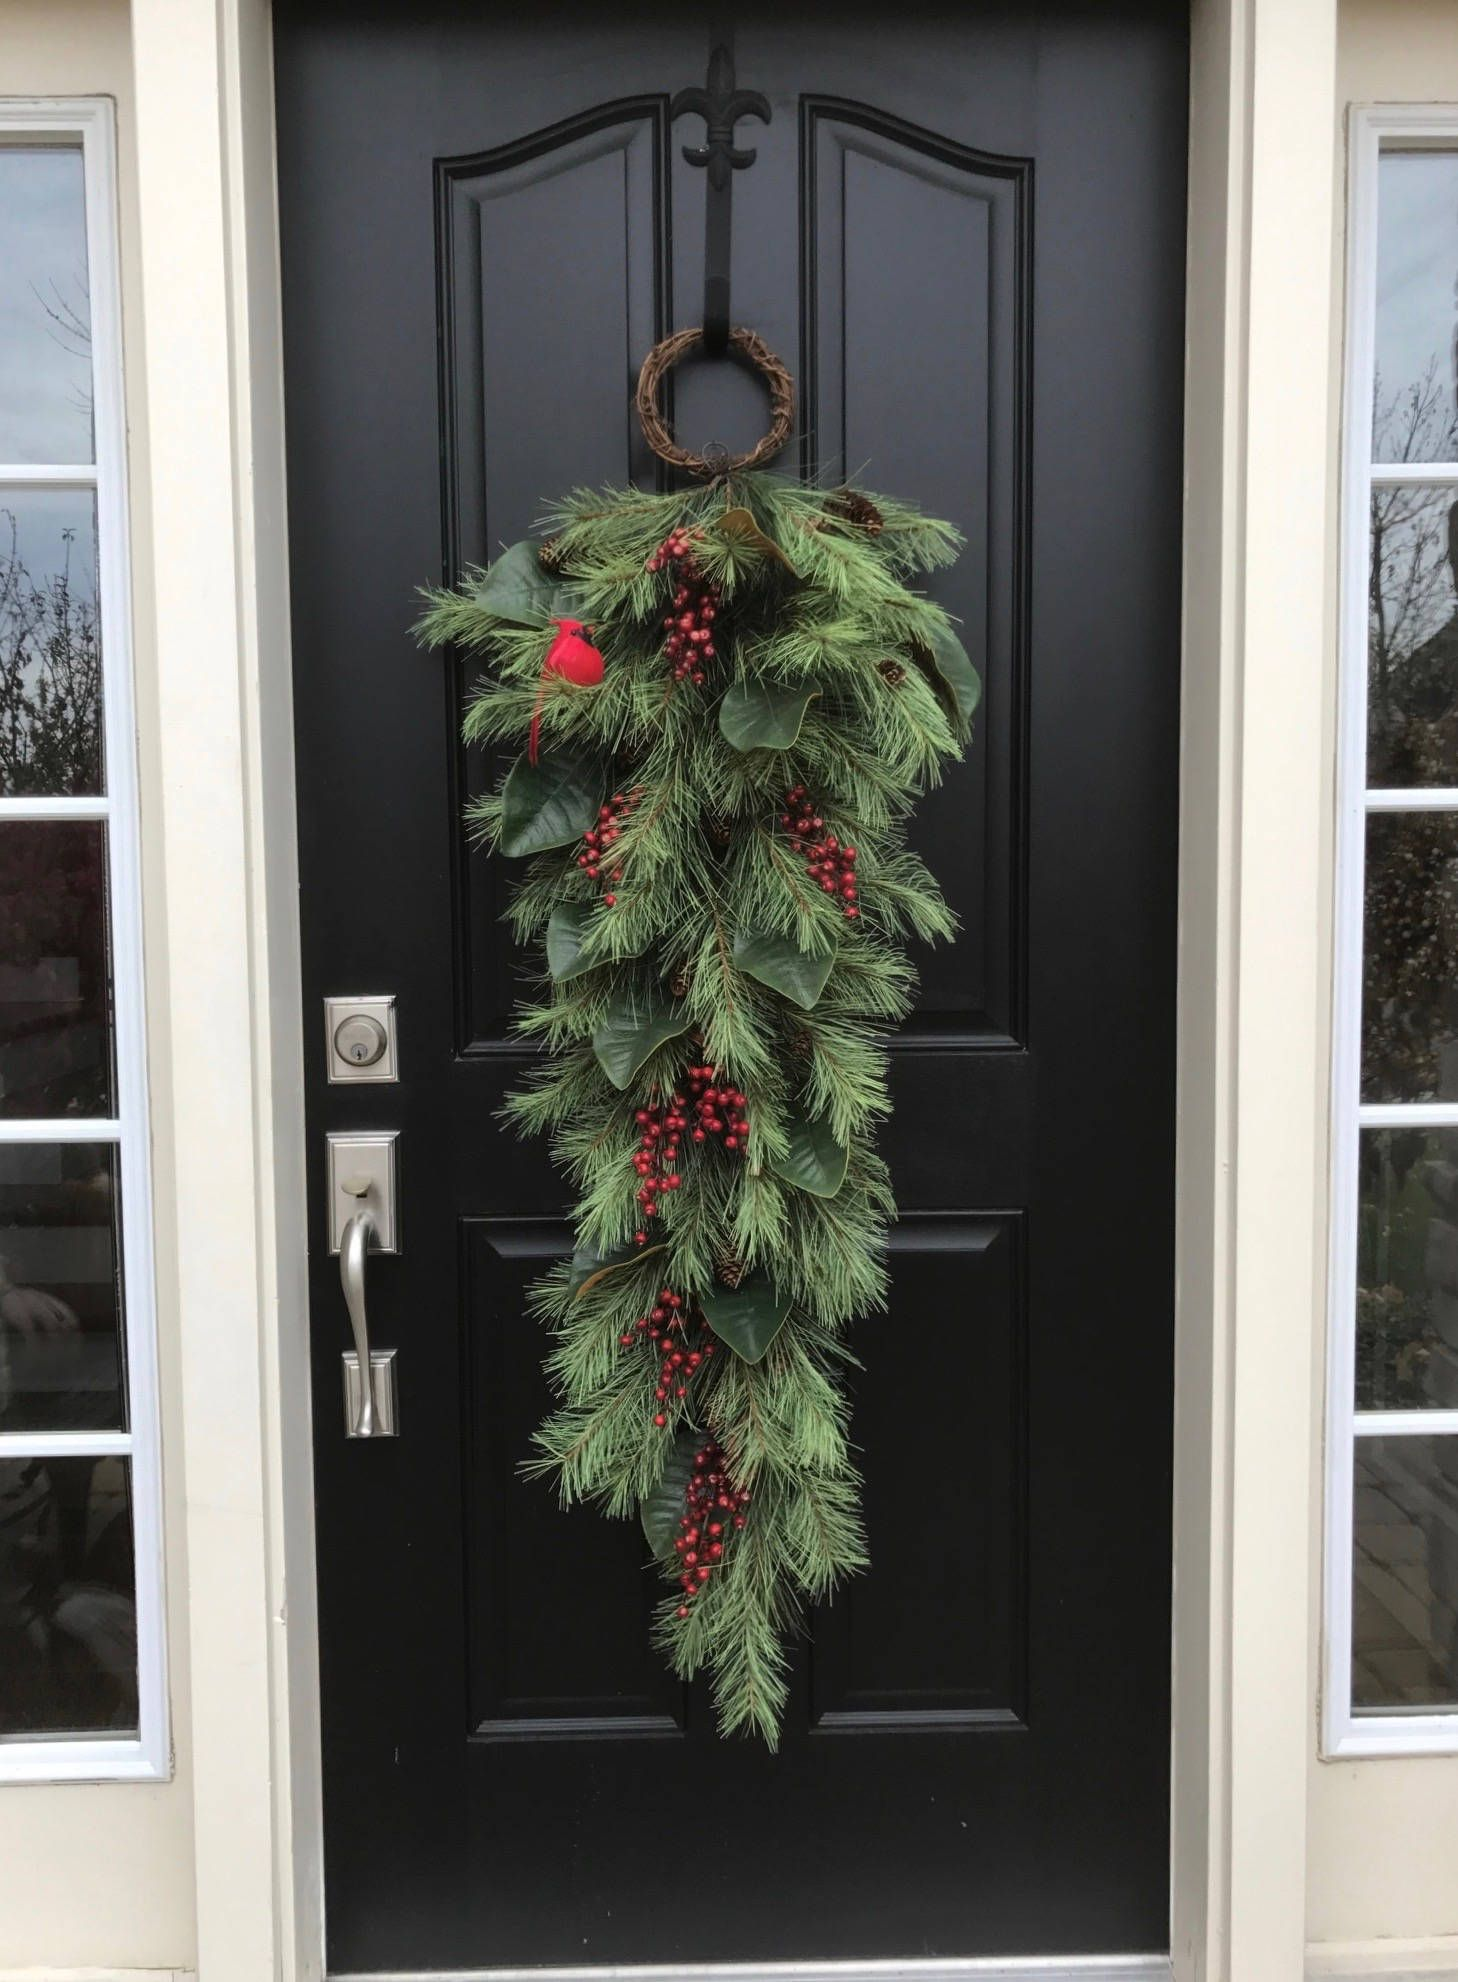 Photo of Christmas Swag, XL Christmas Wreath, Winter Wreath, Holiday Pine Wreath and Magnolia, Front Door Christmas Swags, Pine and Magnolia